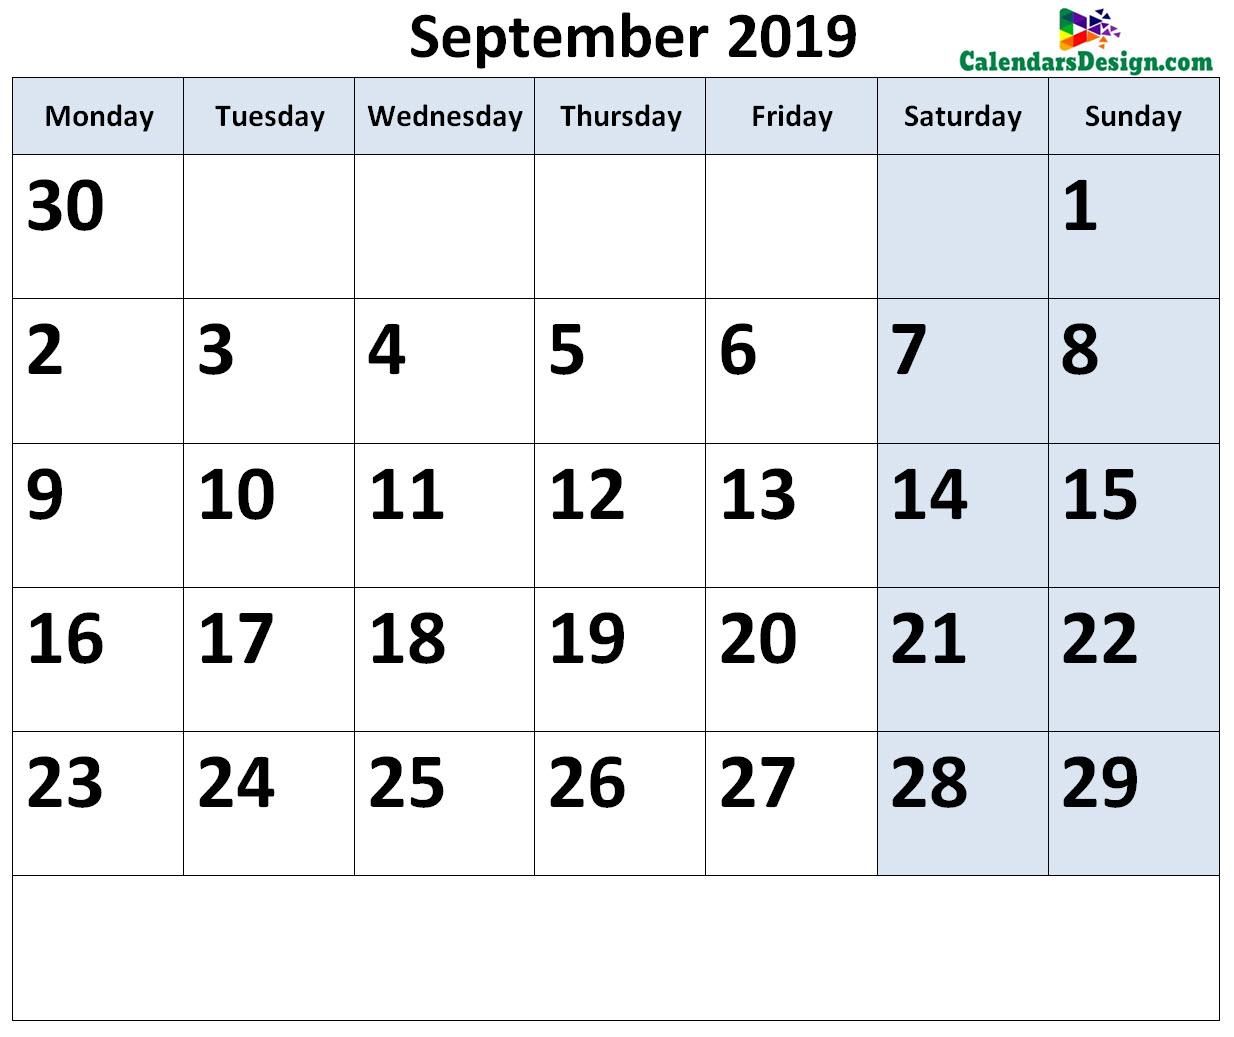 September 2019 Calendar Page